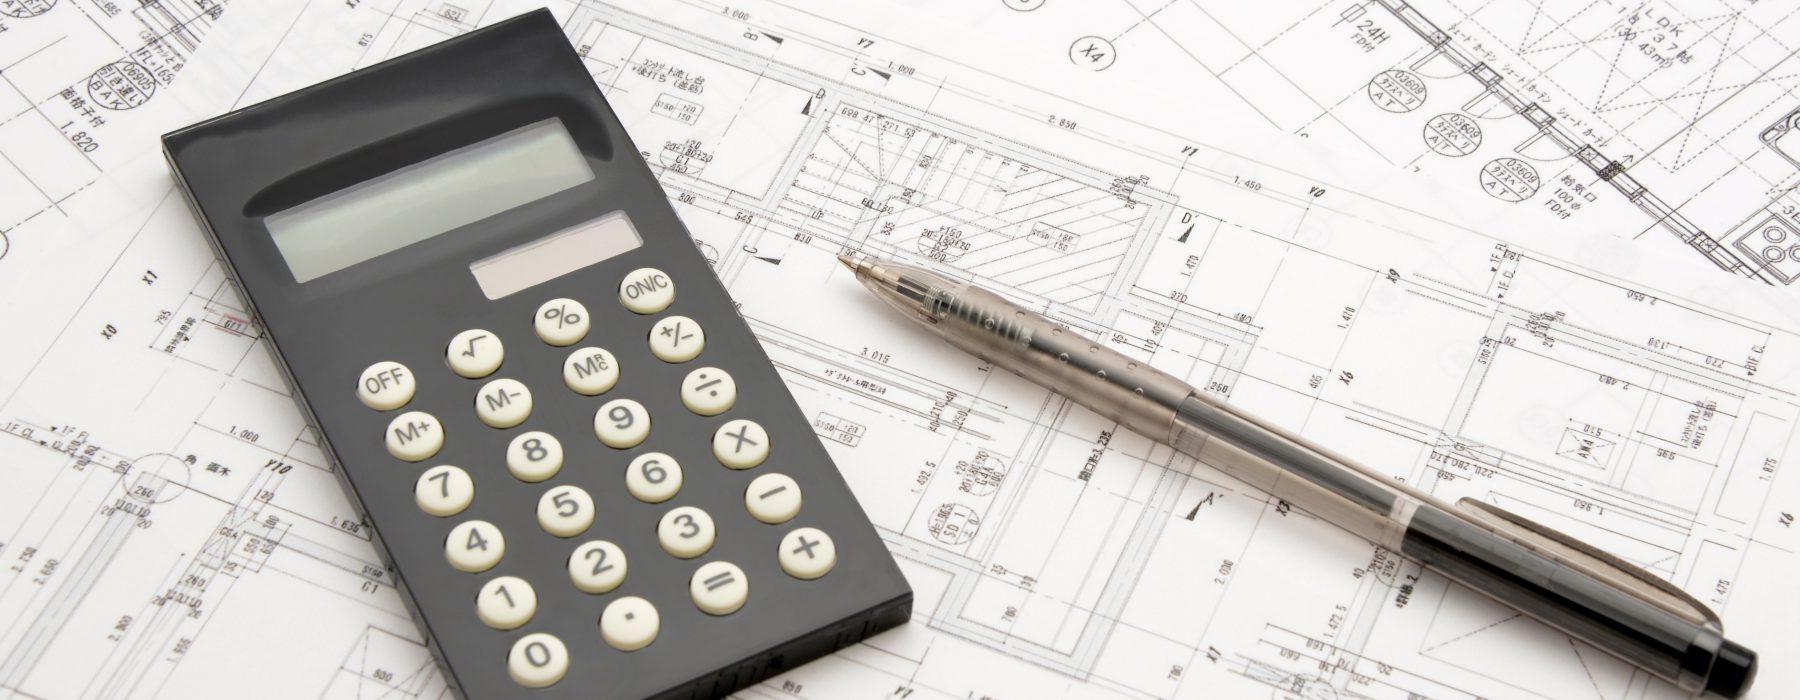 portable sheds construction terms